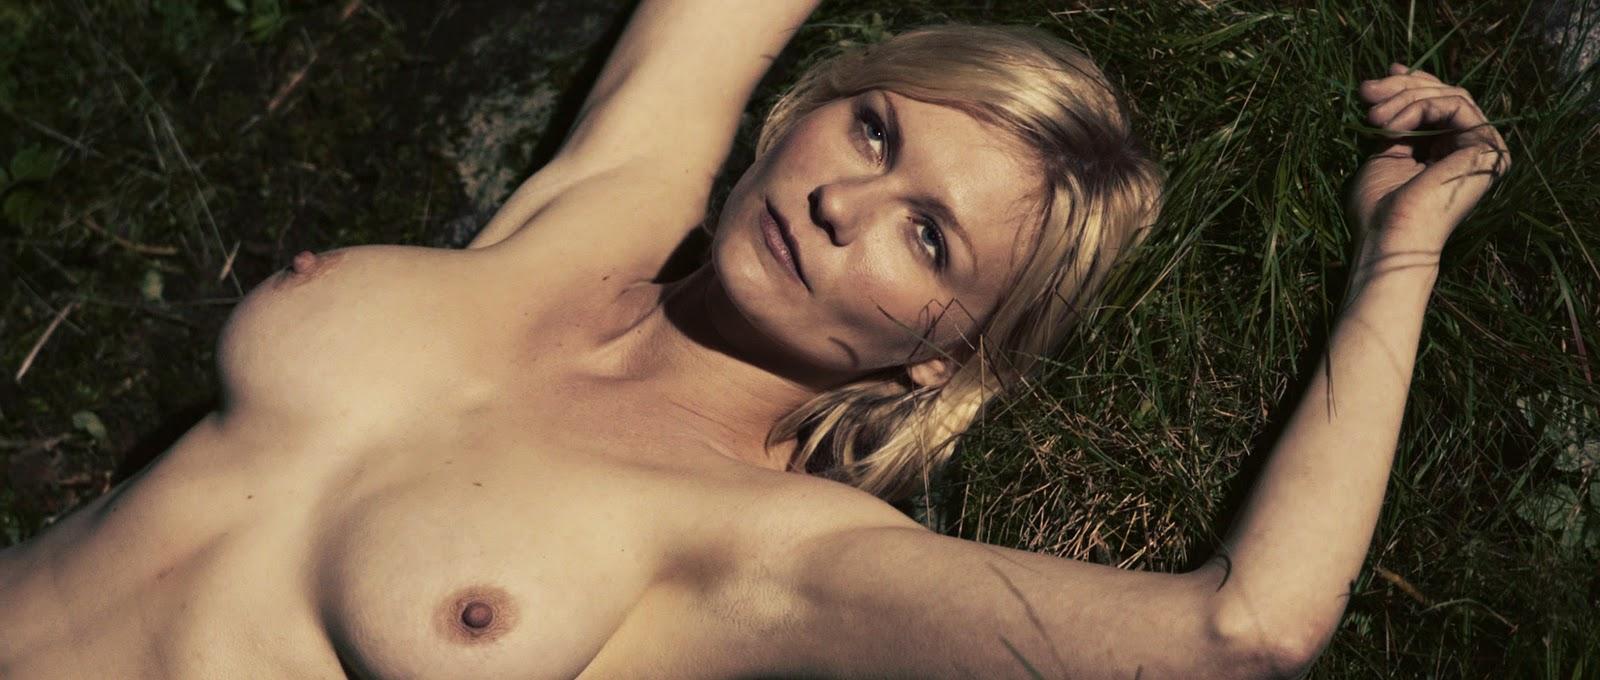 caroline andersen porn sex web chat